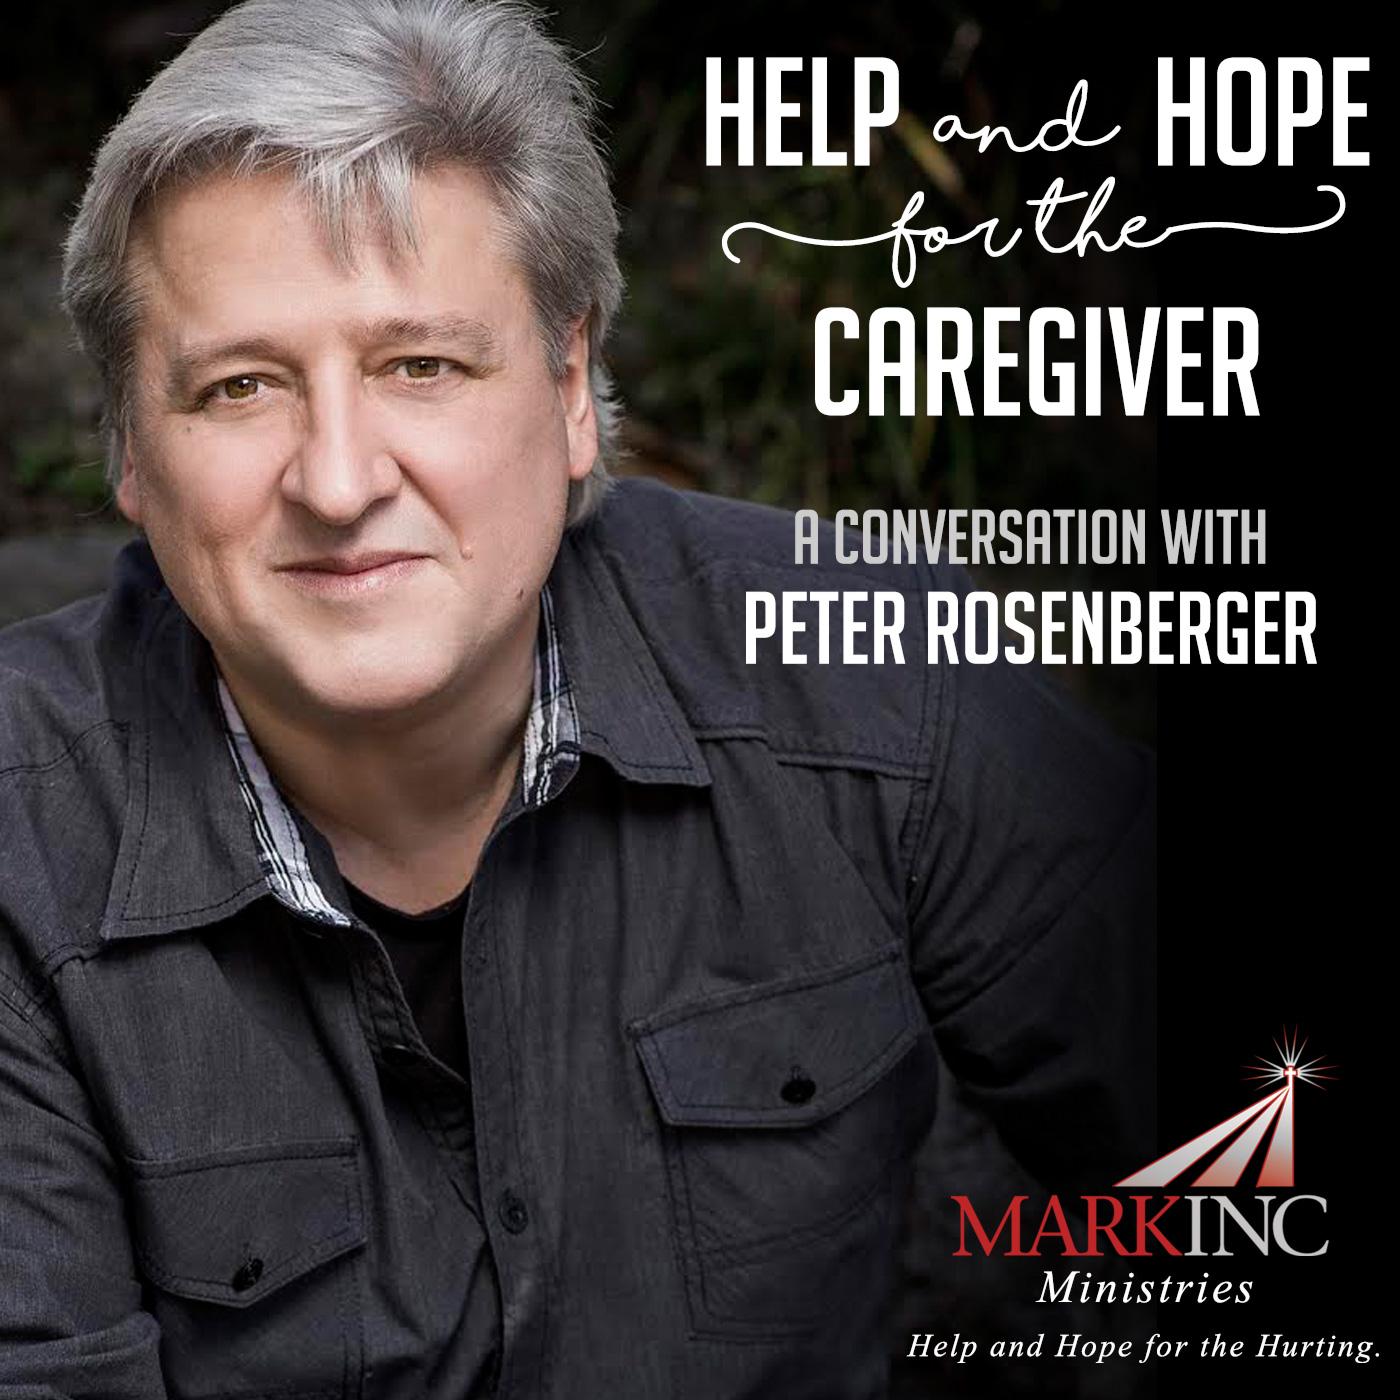 H&H Caregiver Rosenberger SQ.jpg